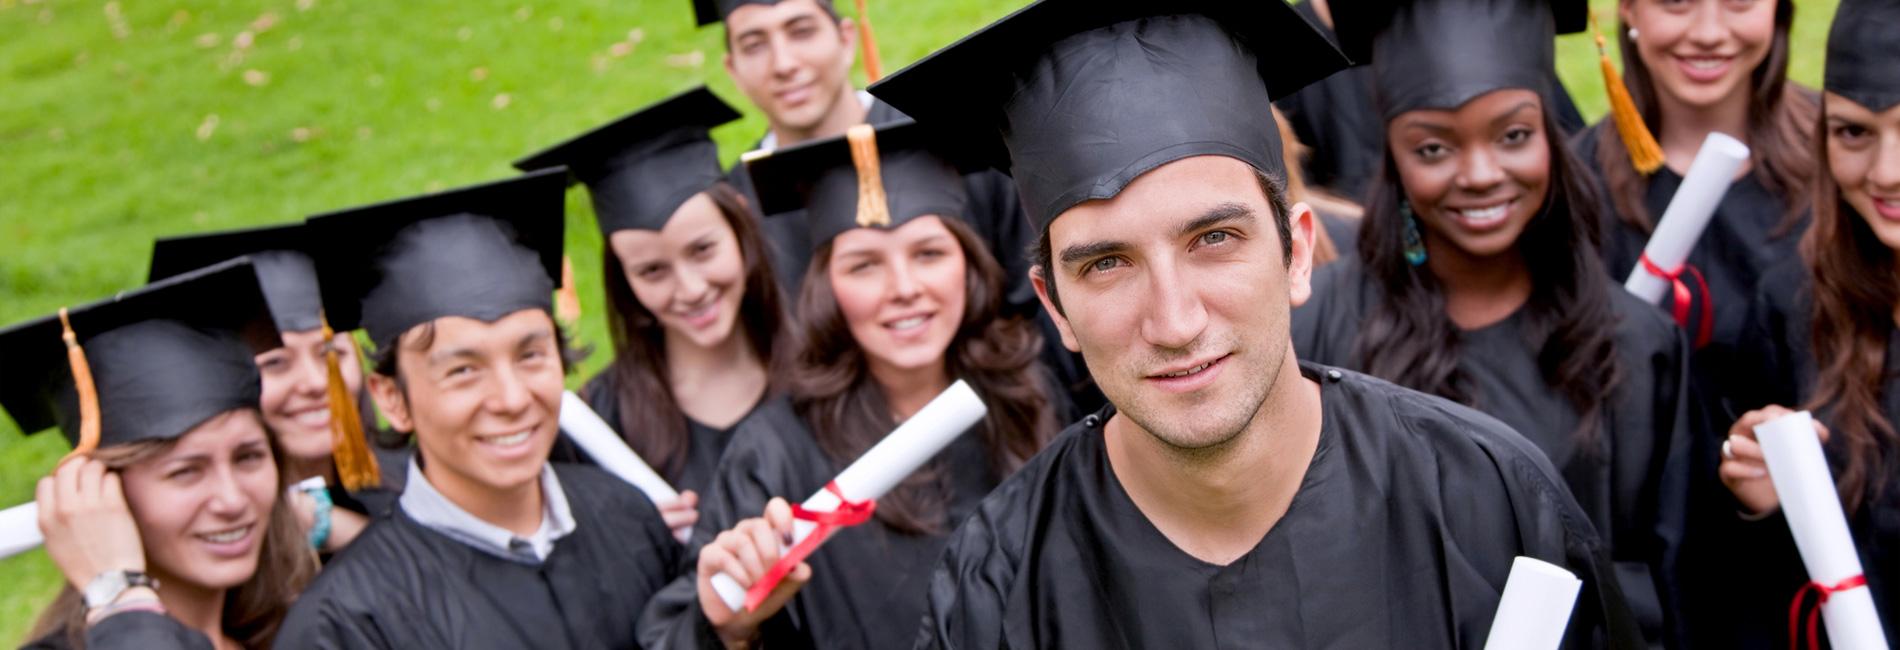 College Graduate Banner